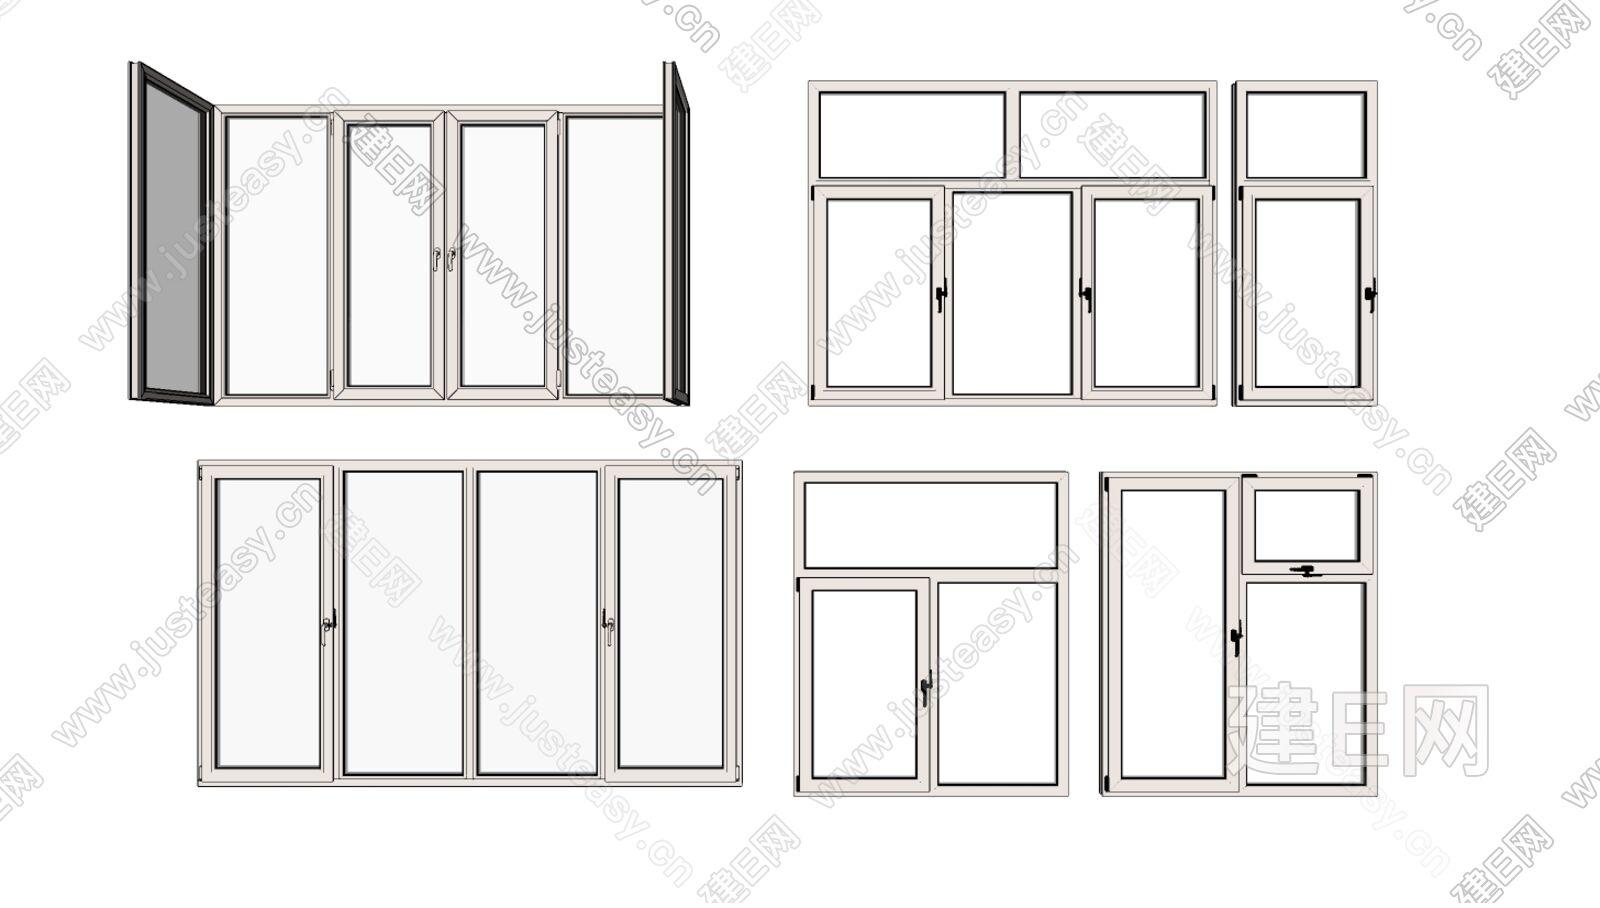 欧式窗户组合sketchup模型